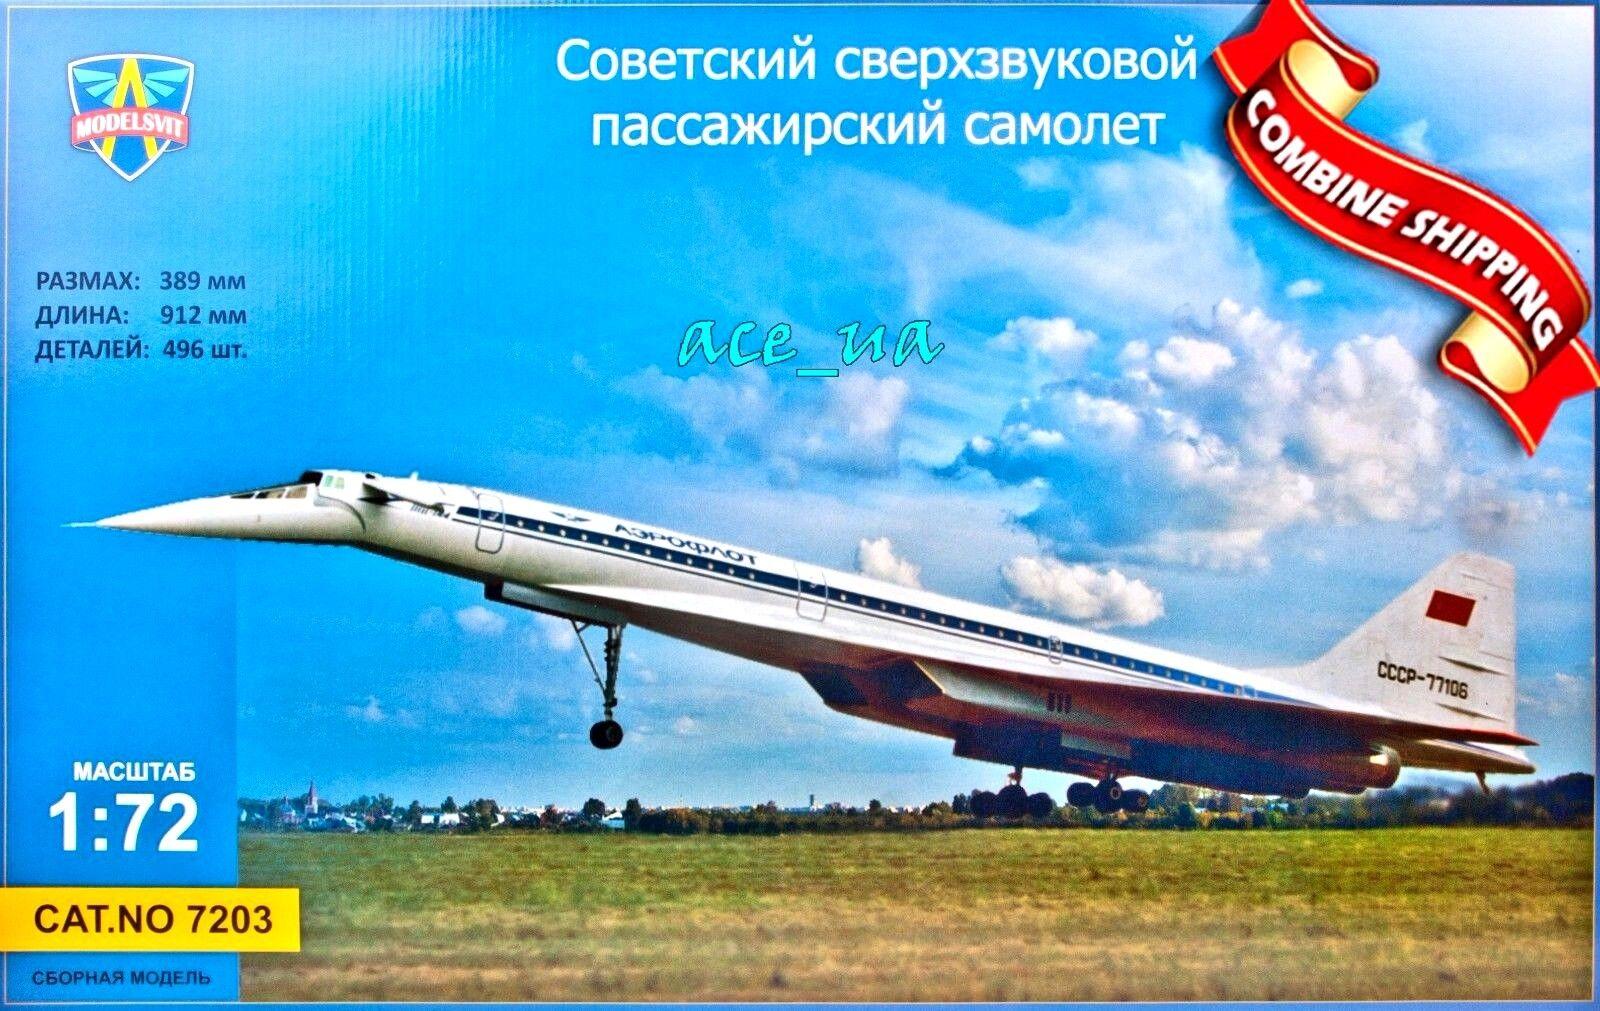 Modelsvit 7203 Tupolev Tu-144 Supersonic Airliner code Charger Plastic Kit 1 72